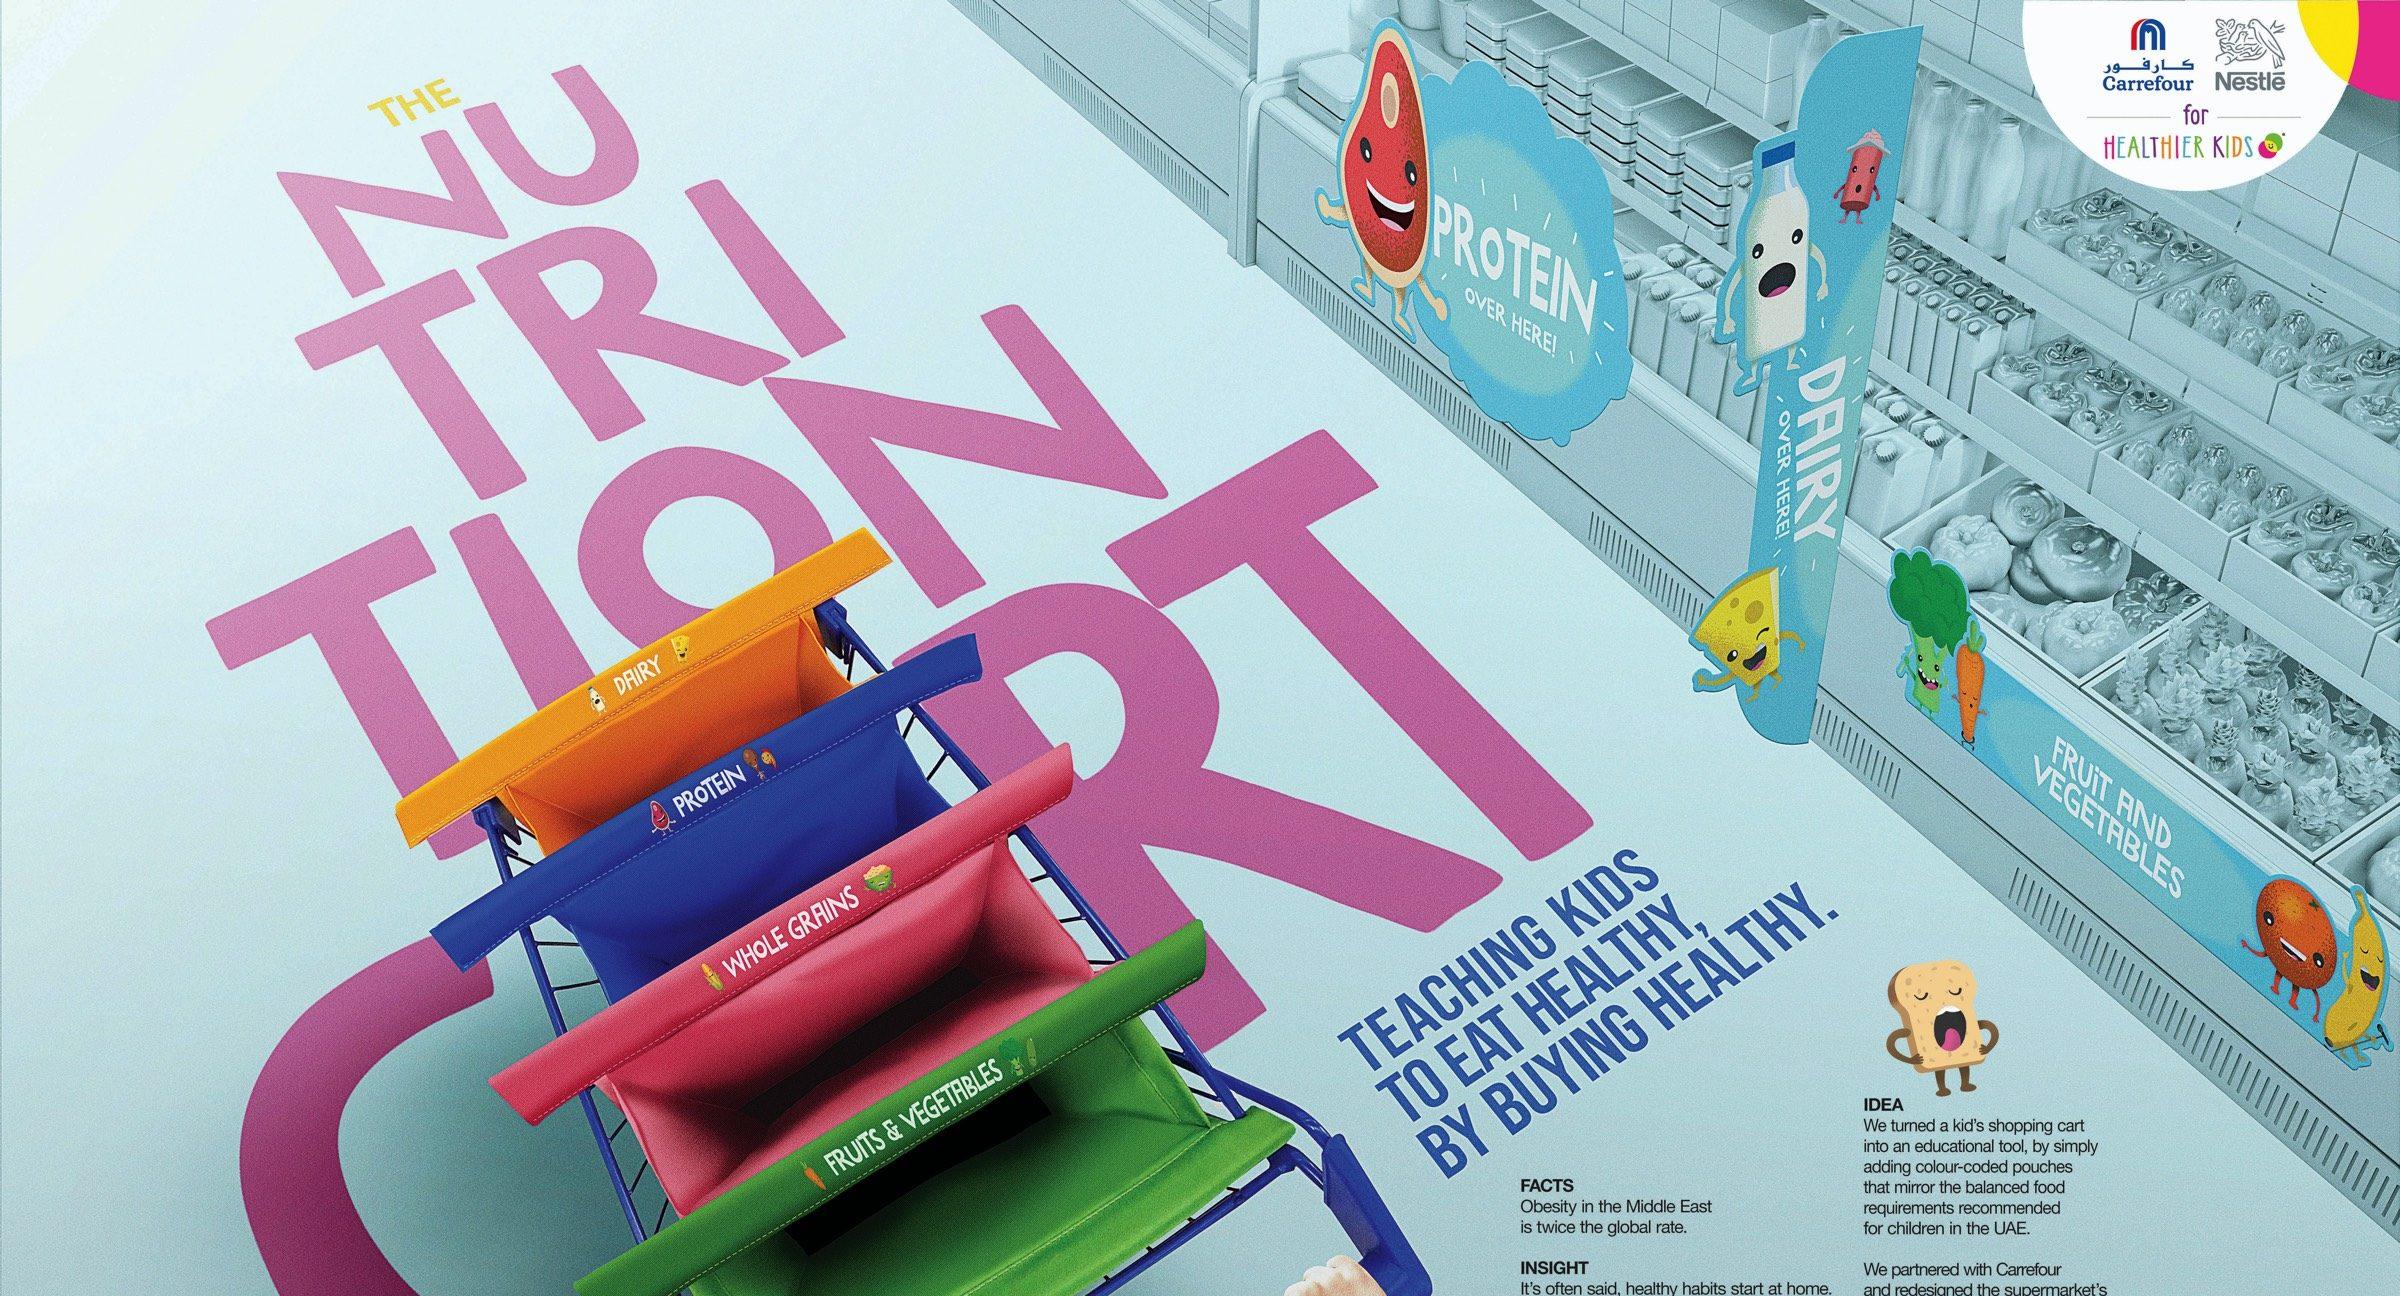 Nestlé for Healthier Kids เปลี่ยนรถเข็นซูเปอร์มาร์เก็ตสำหรับเด็กเป็นรถเรียนรู้โภชนาการทางอาหารแสนสนุก